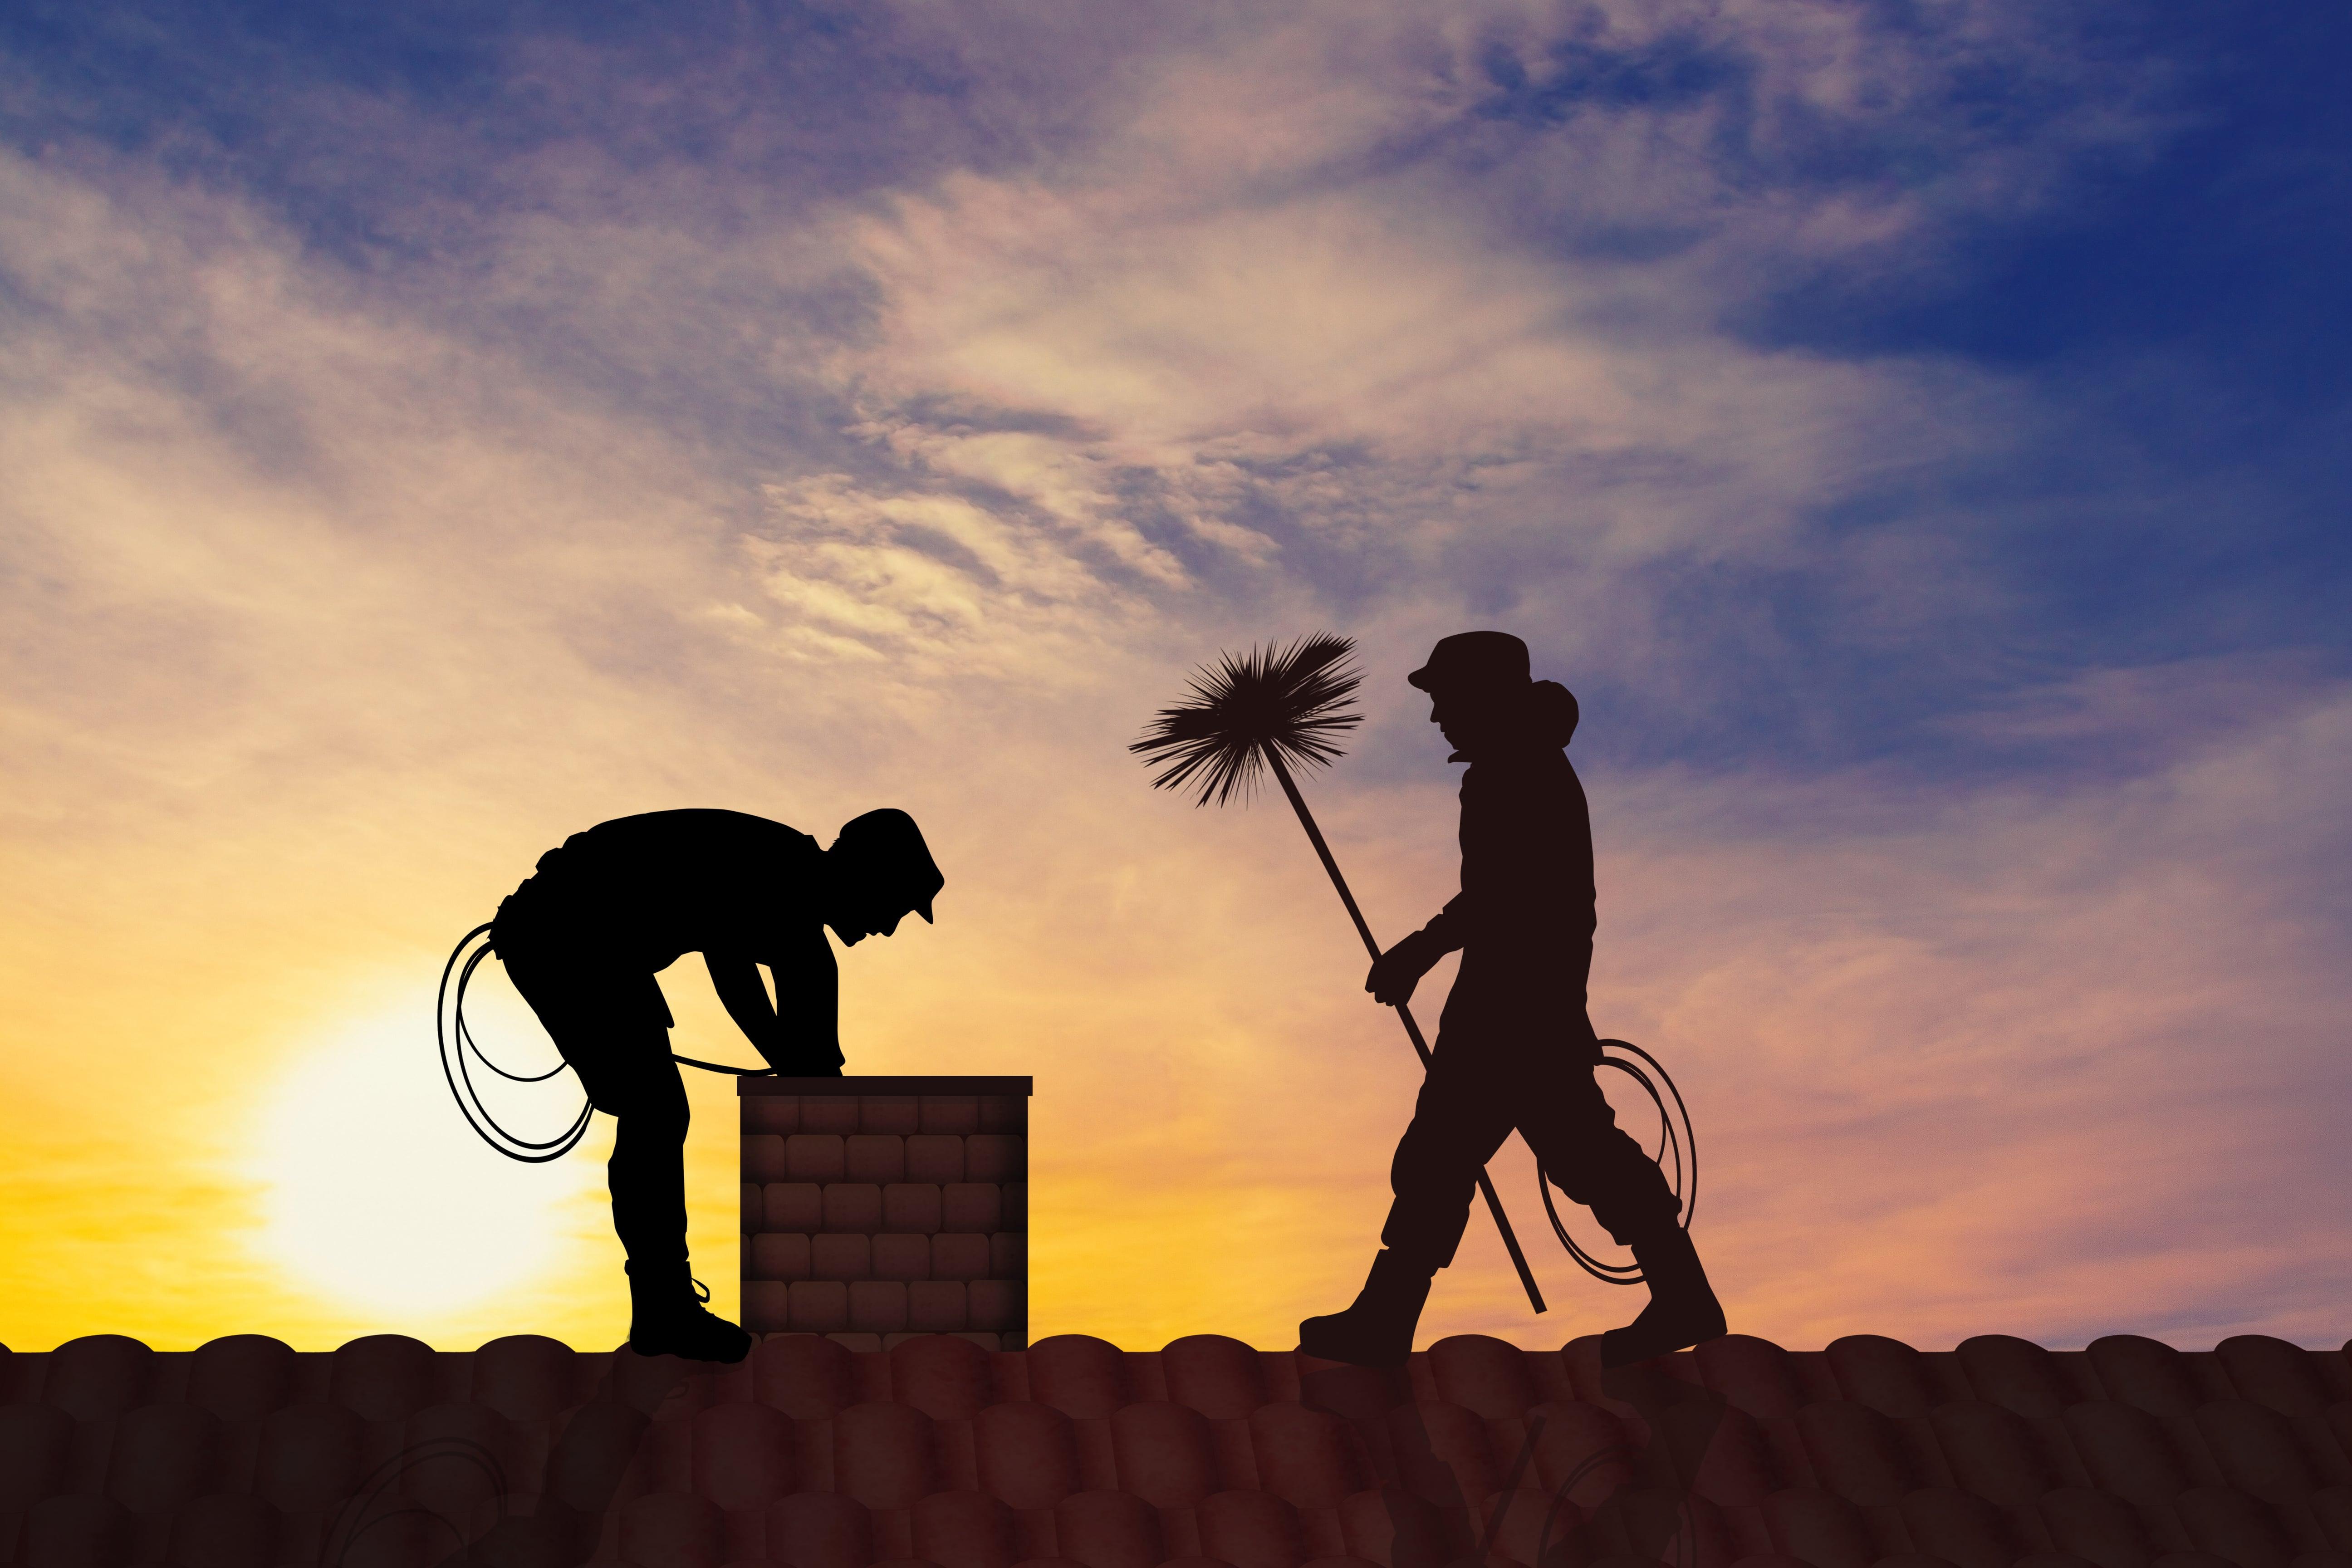 Chimney Inspection, Chimney Sweep